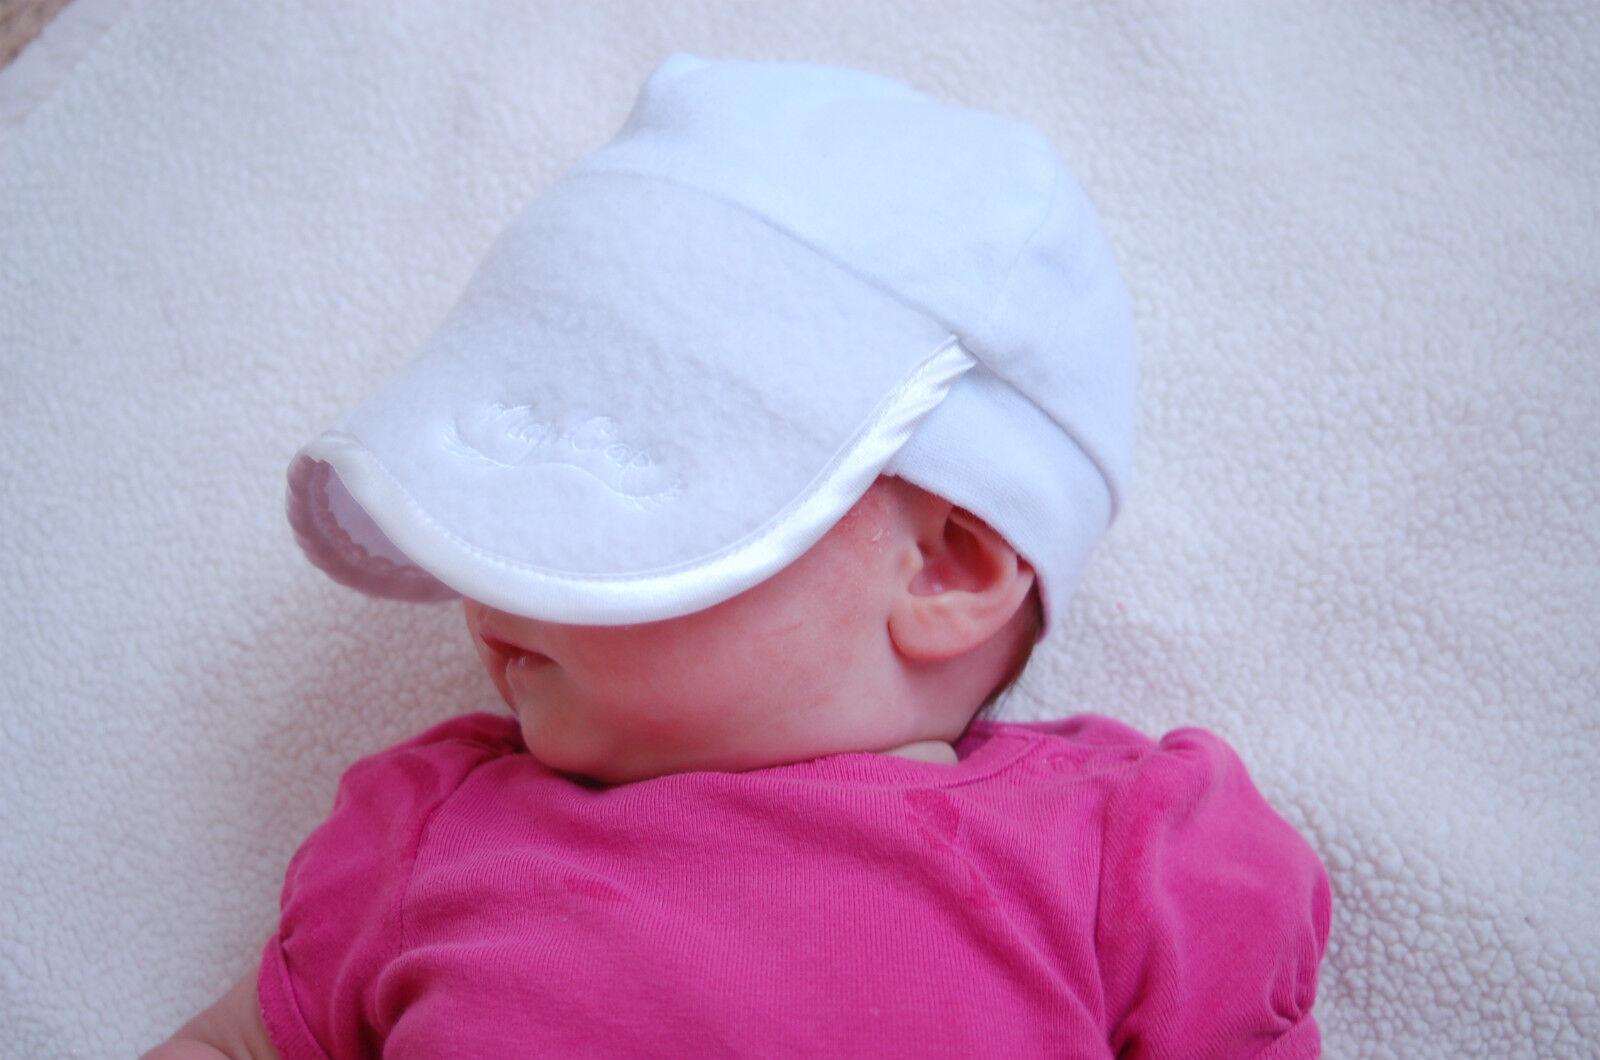 12923dd57 Baby Nap Cap; Infant Sleep Aid Mask and Sun Shade Visor, Pediatrician  Approved